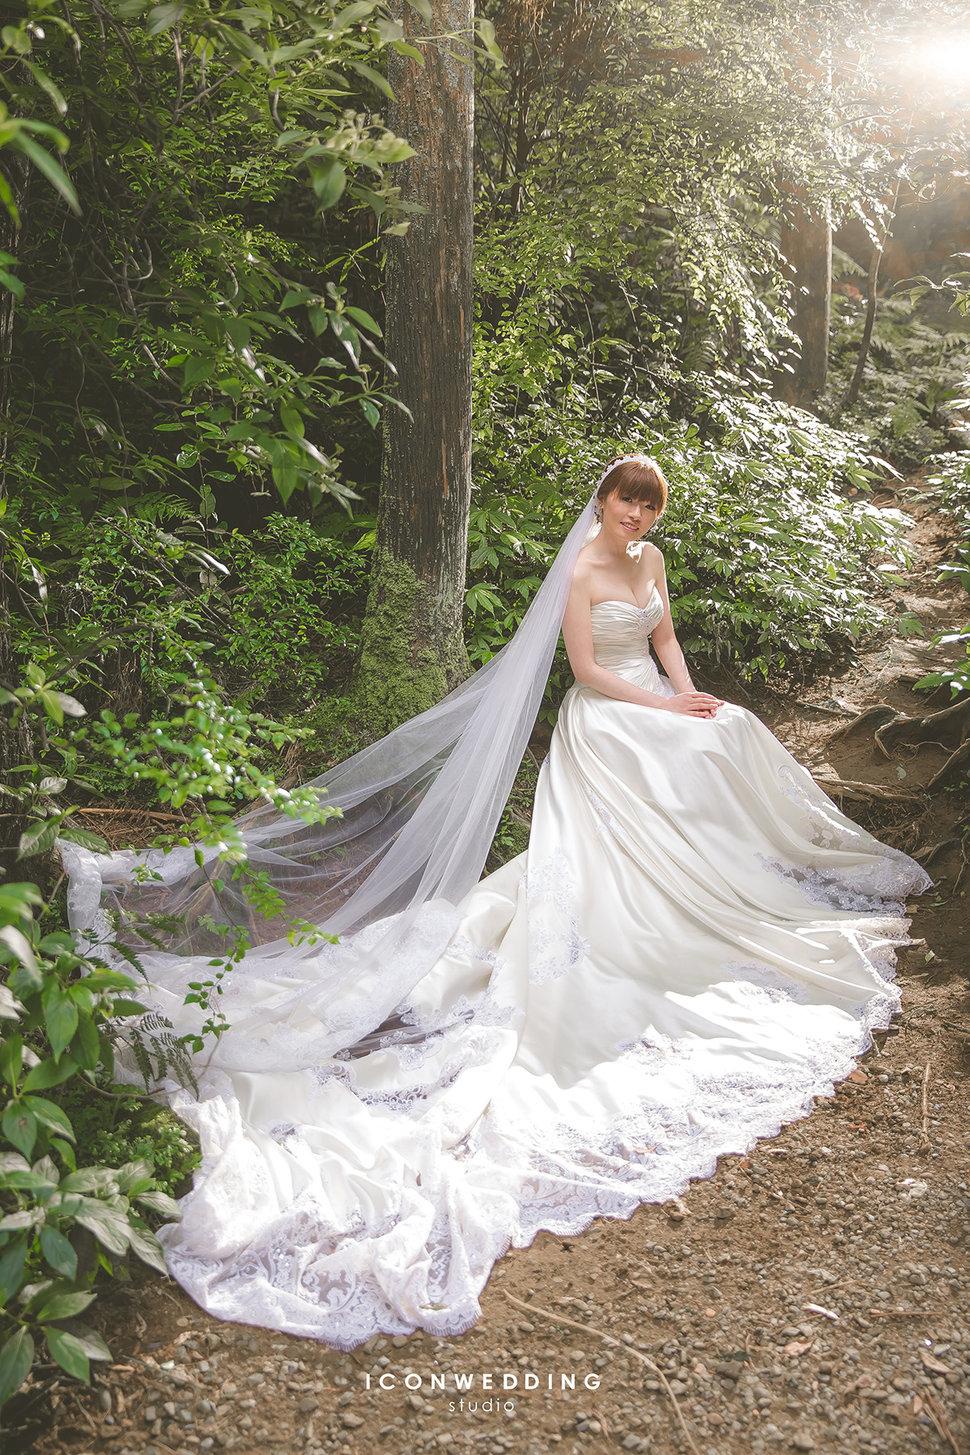 AD7X1608 - 愛情符號 ‧ 玩拍婚紗 ‧ 海外婚紗 - 結婚吧